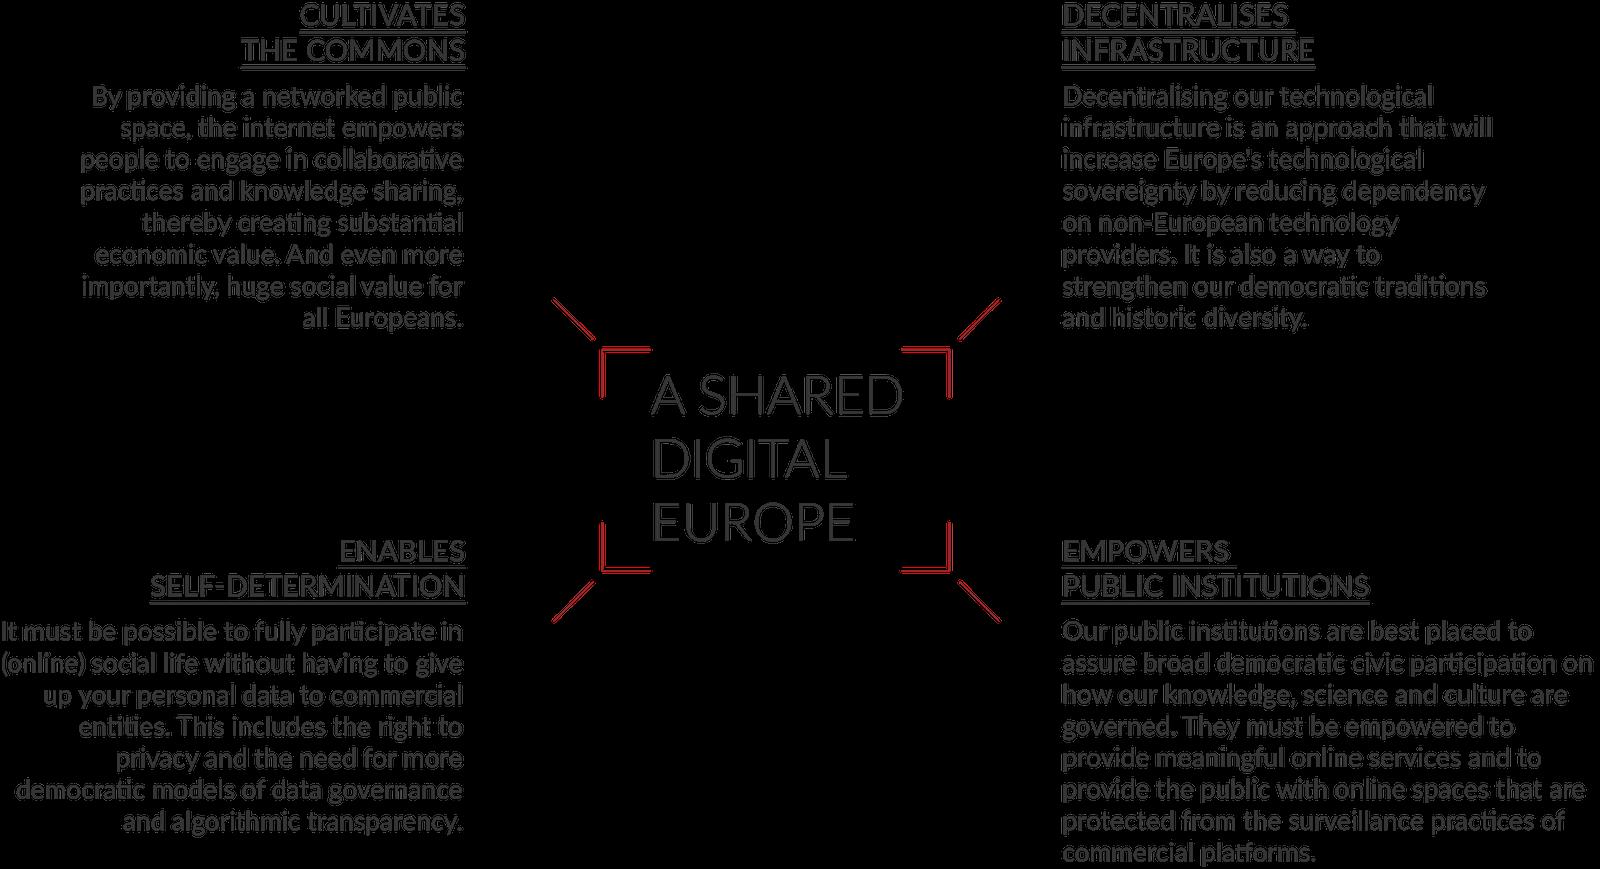 Shared Digital Euroep - four principles